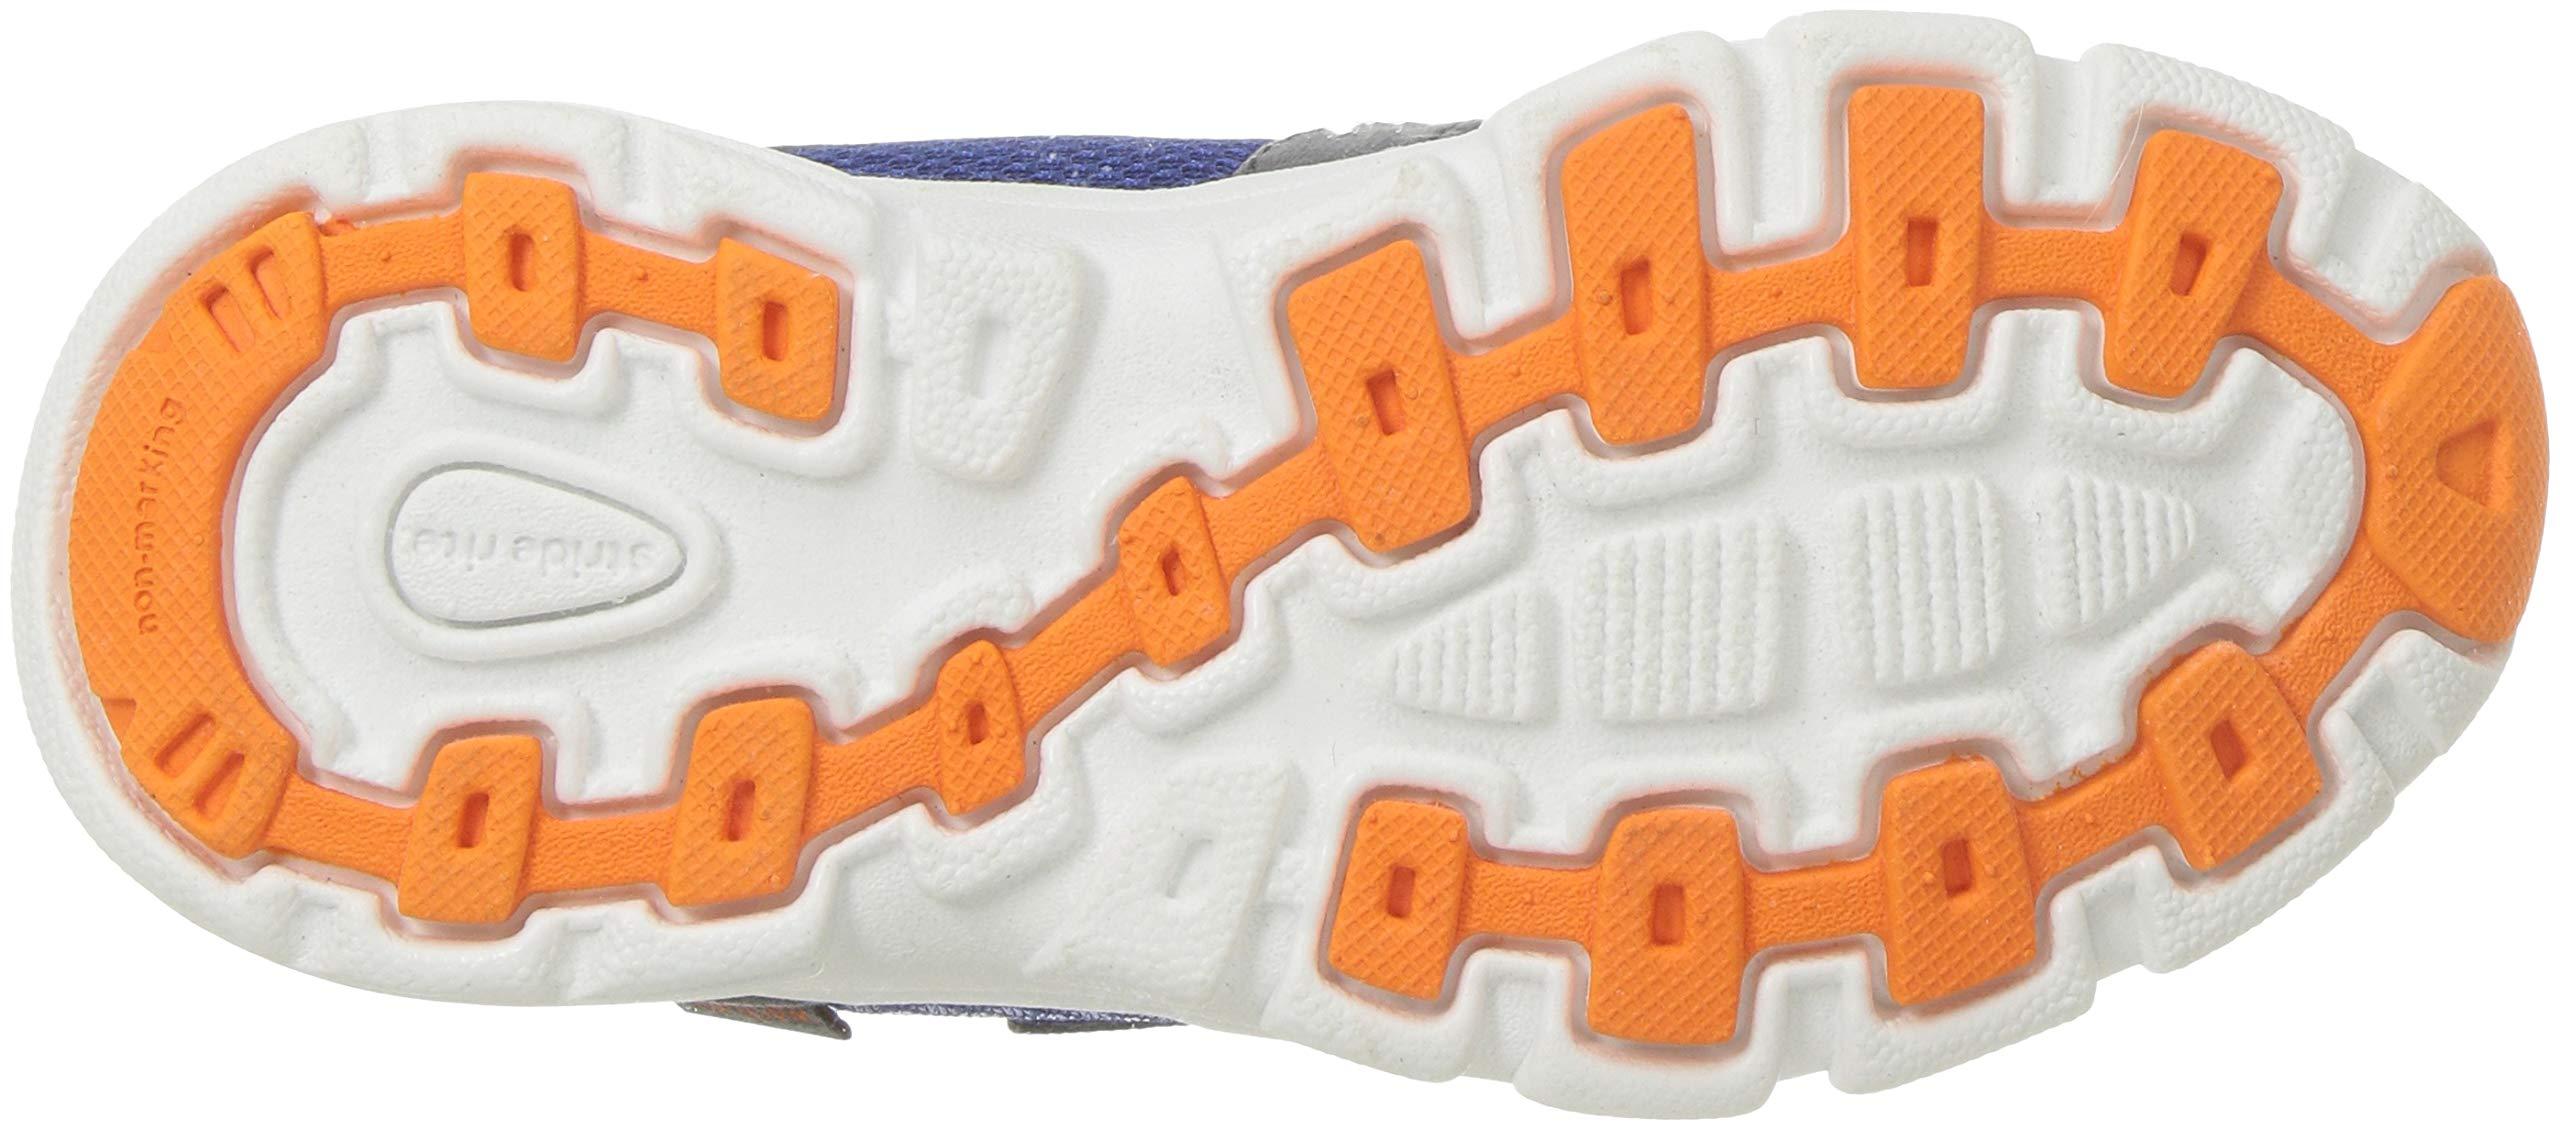 Stride Rite Boys' Made 2 Play Taylor Sneaker, Navy/Orange 7.5 M US Toddler by Stride Rite (Image #3)